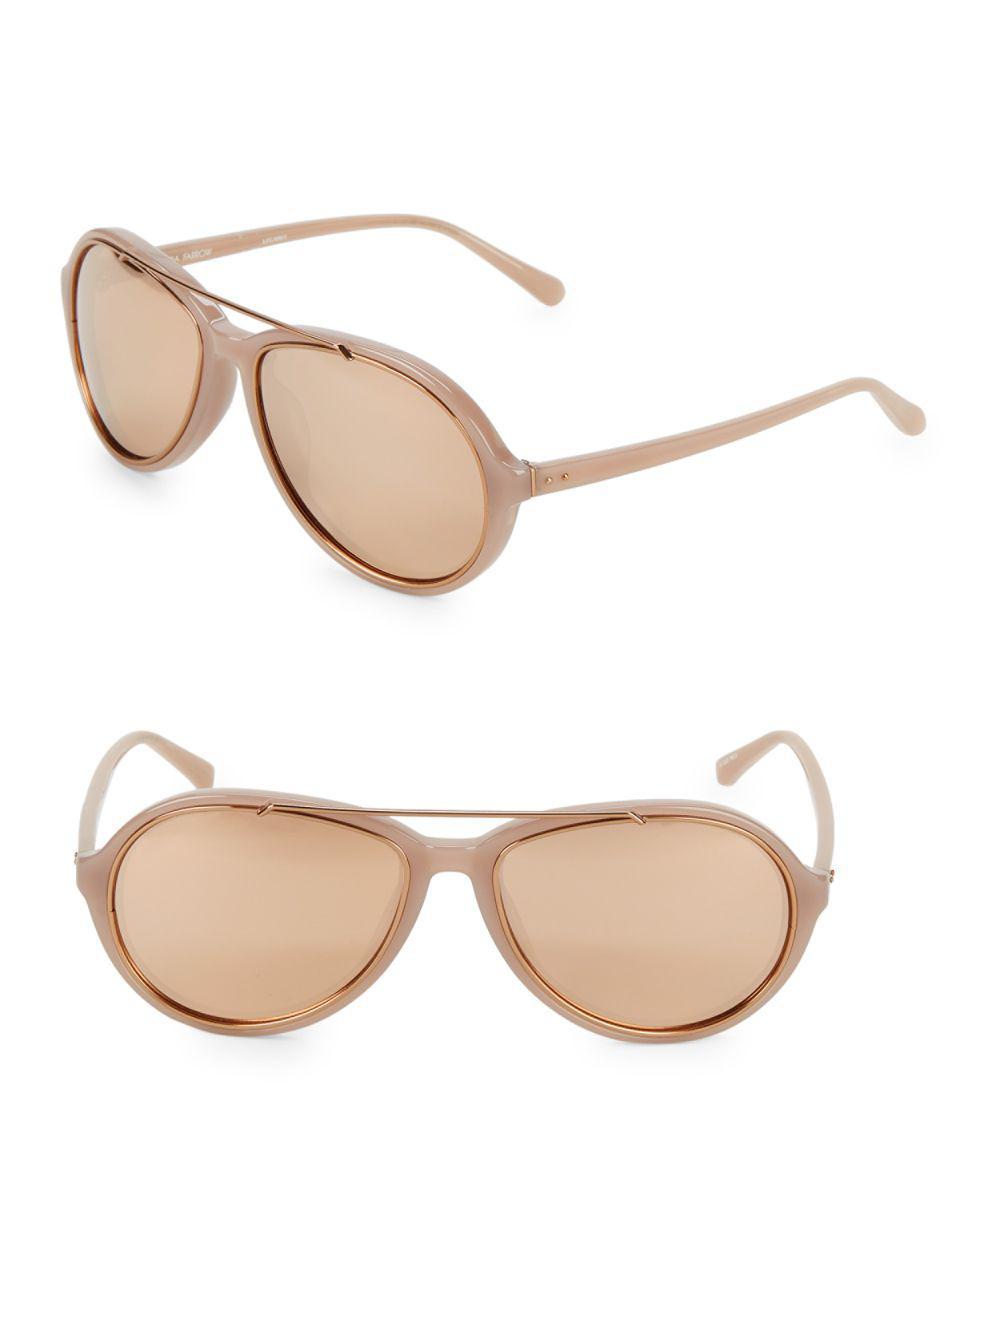 27411a675bb Linda Farrow. Women s 59mm Oval Sunglasses